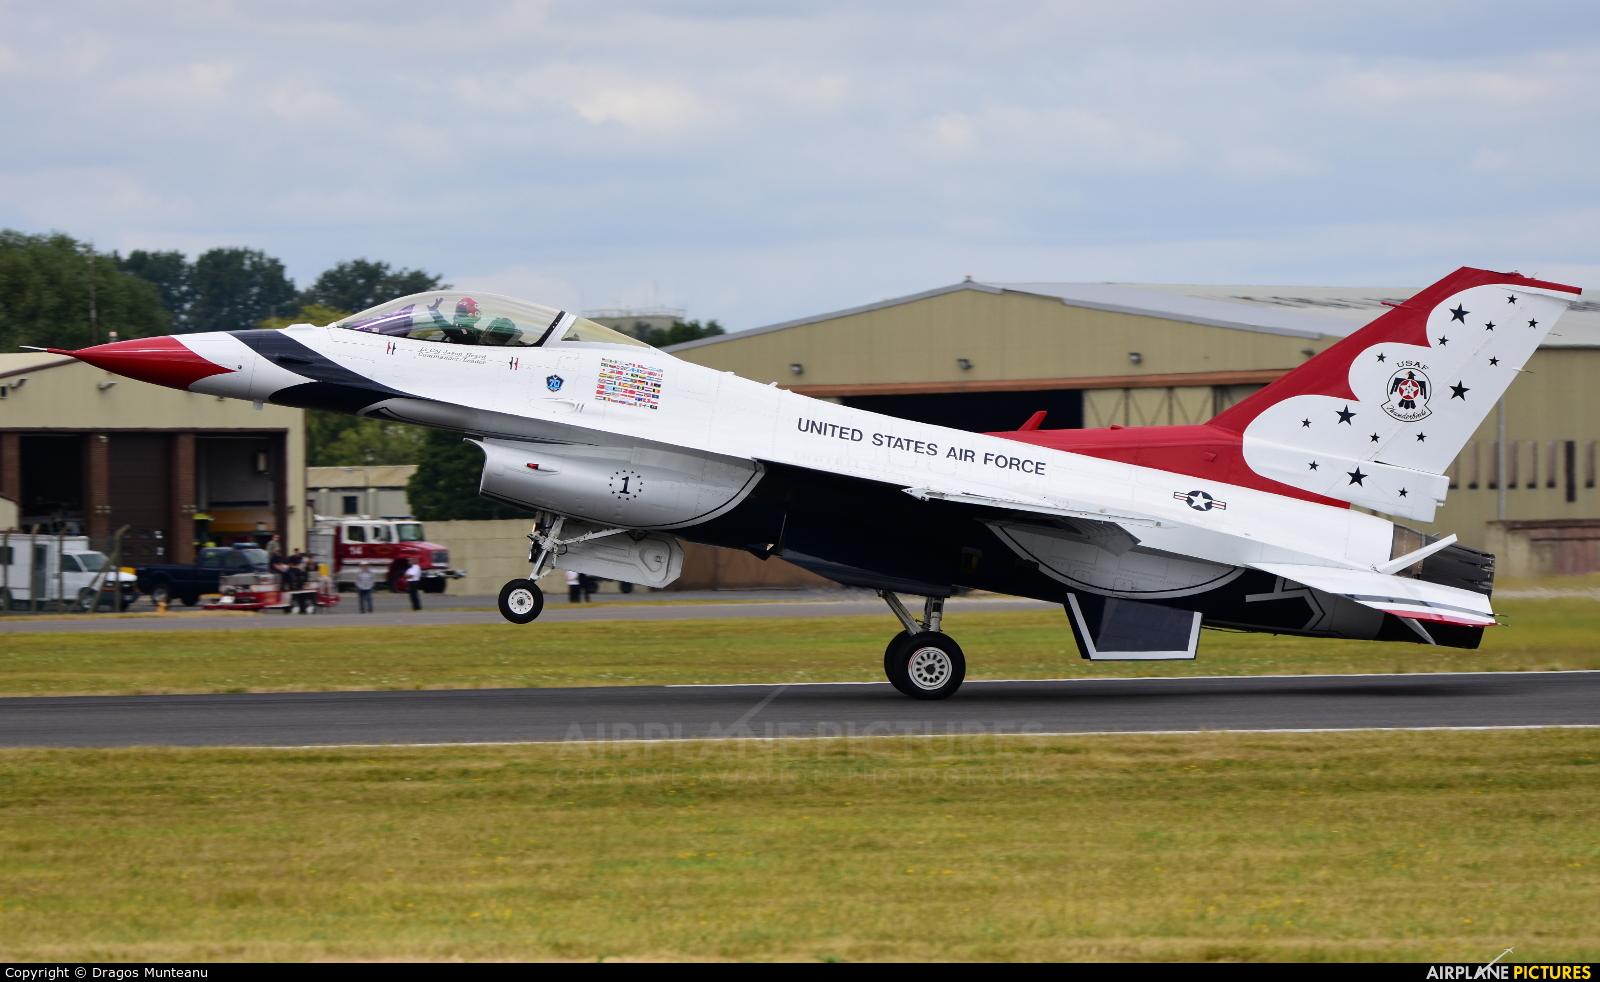 USA - Air Force : Thunderbirds 1 aircraft at Fairford